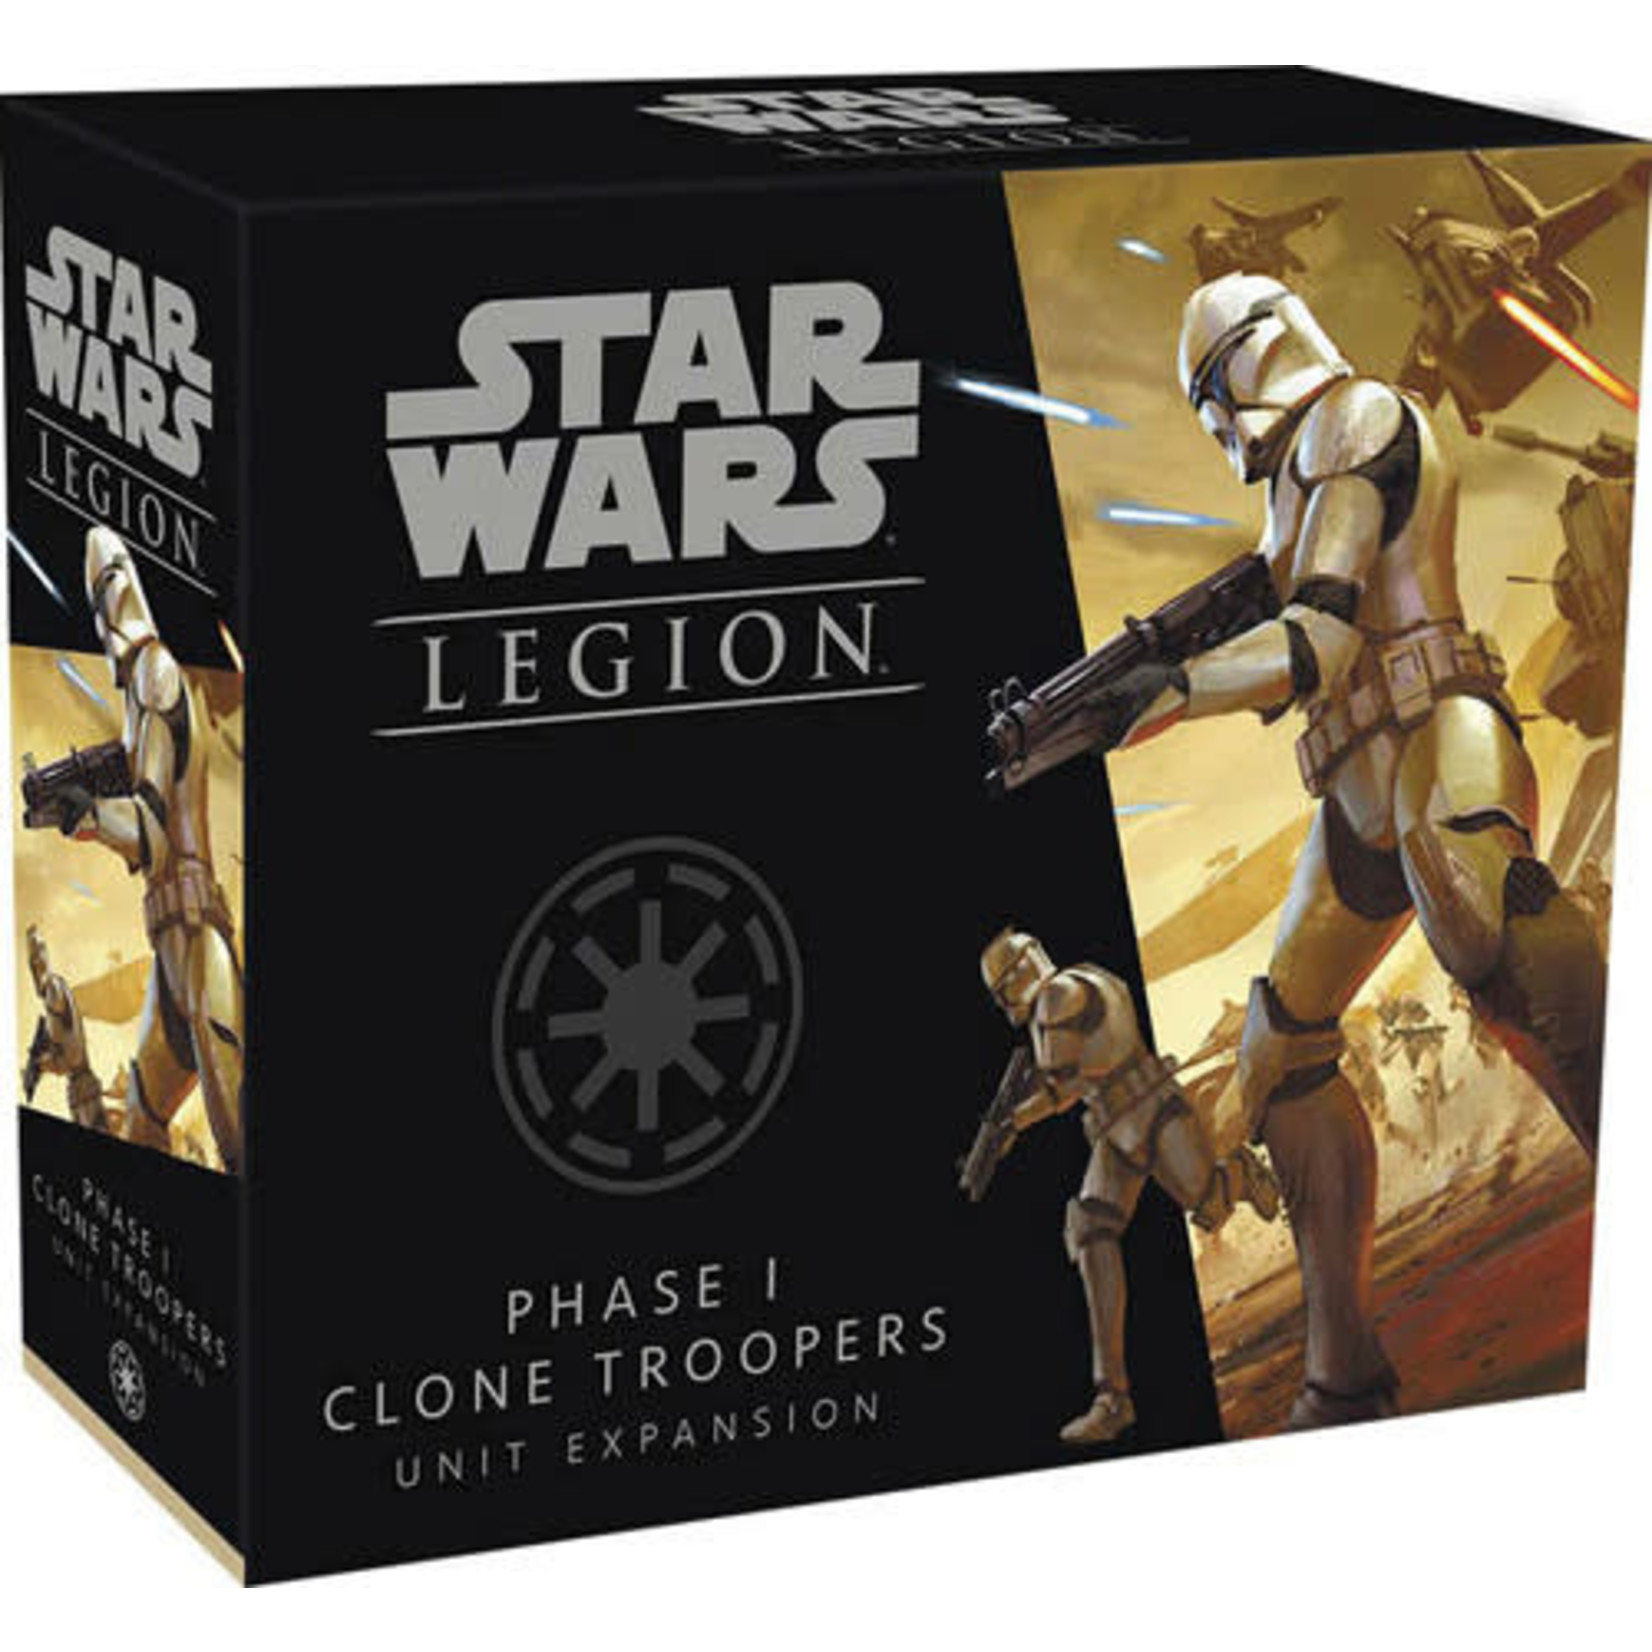 Star Wars Legion: Phase 1 Clone Trooper Unit Expansion